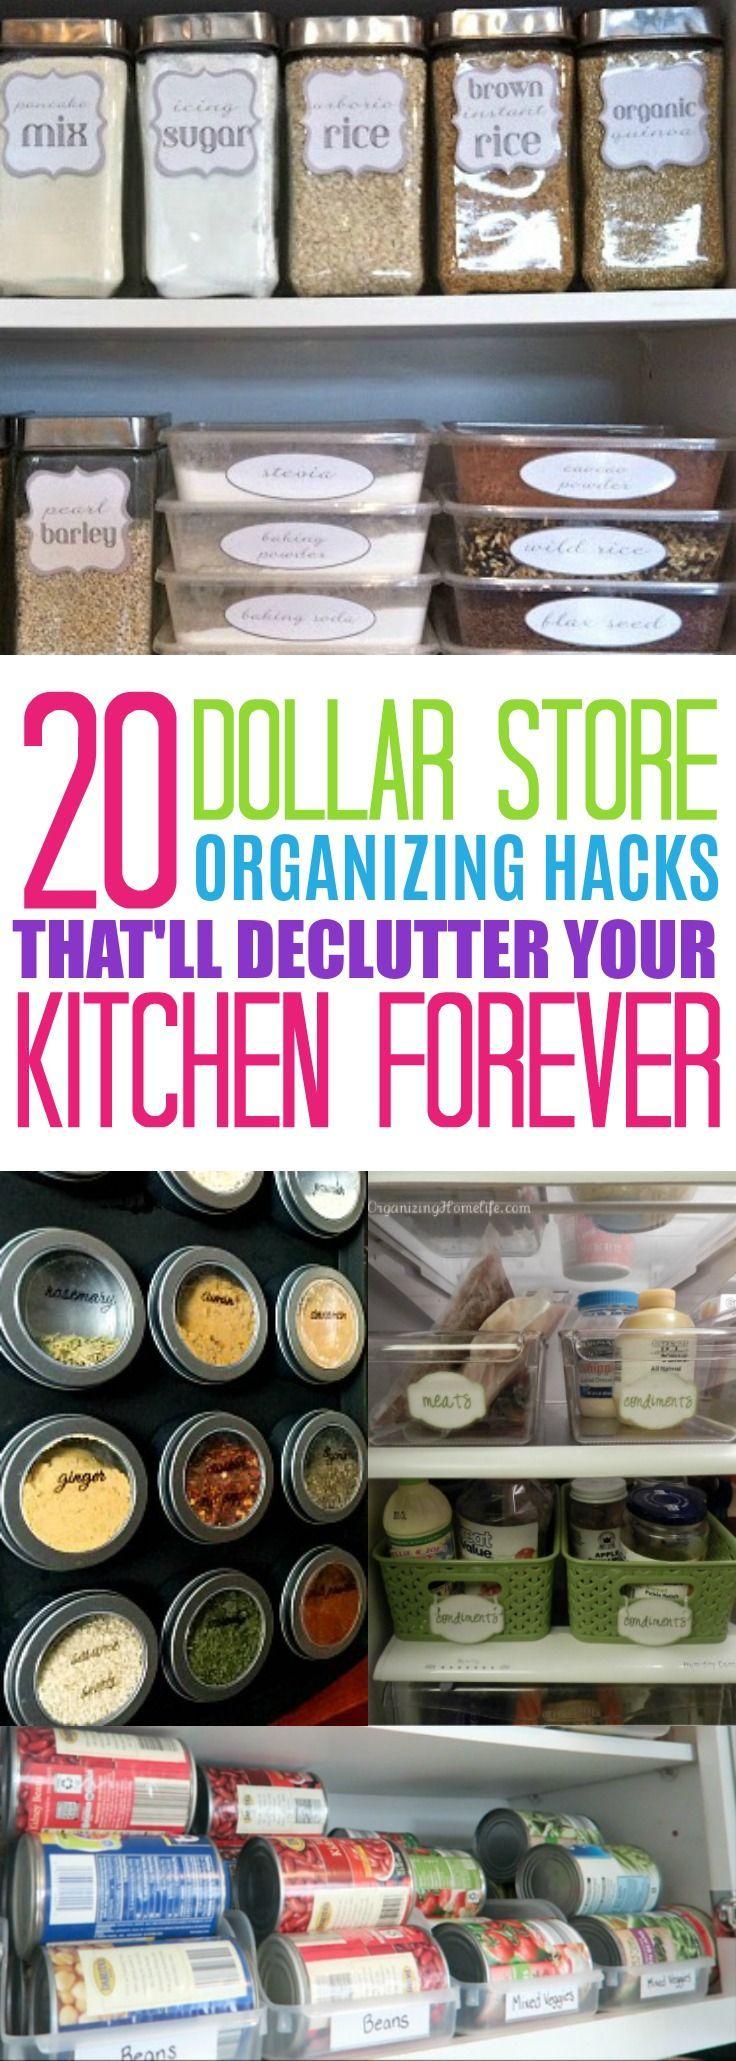 Dollar Store Kitchen Organization Hacks,Dollar Store Kitchen Organizing Ideas, Organizing Tips For The Home